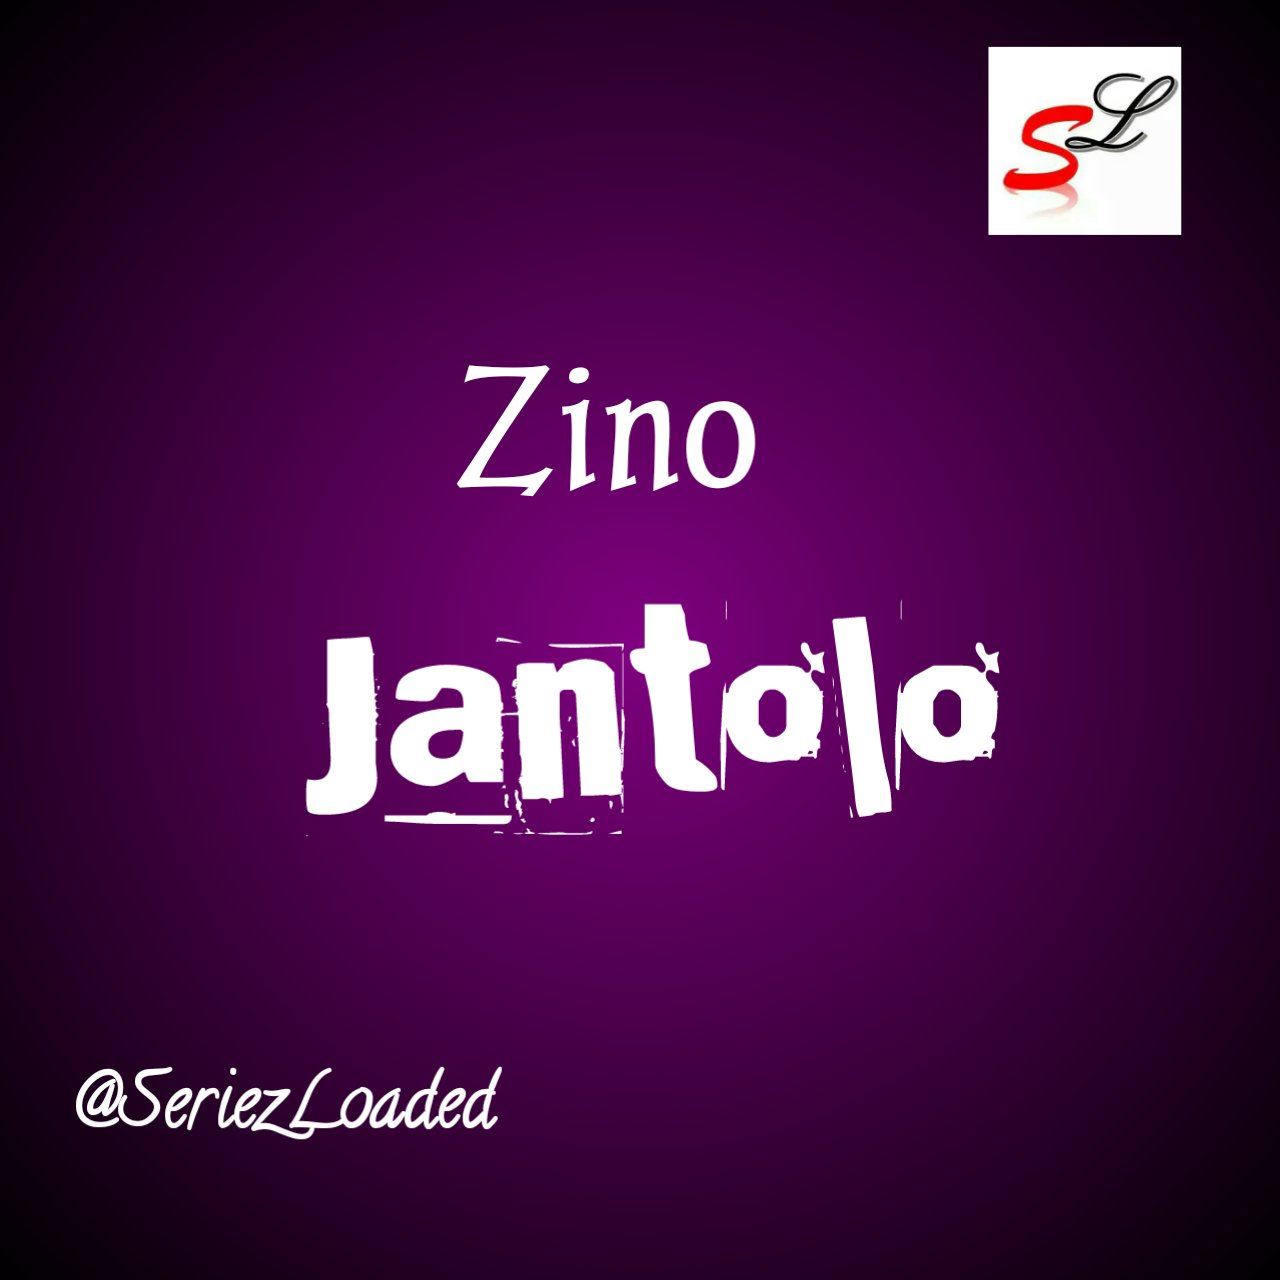 Zino Jantolo Mp3 Download Audio